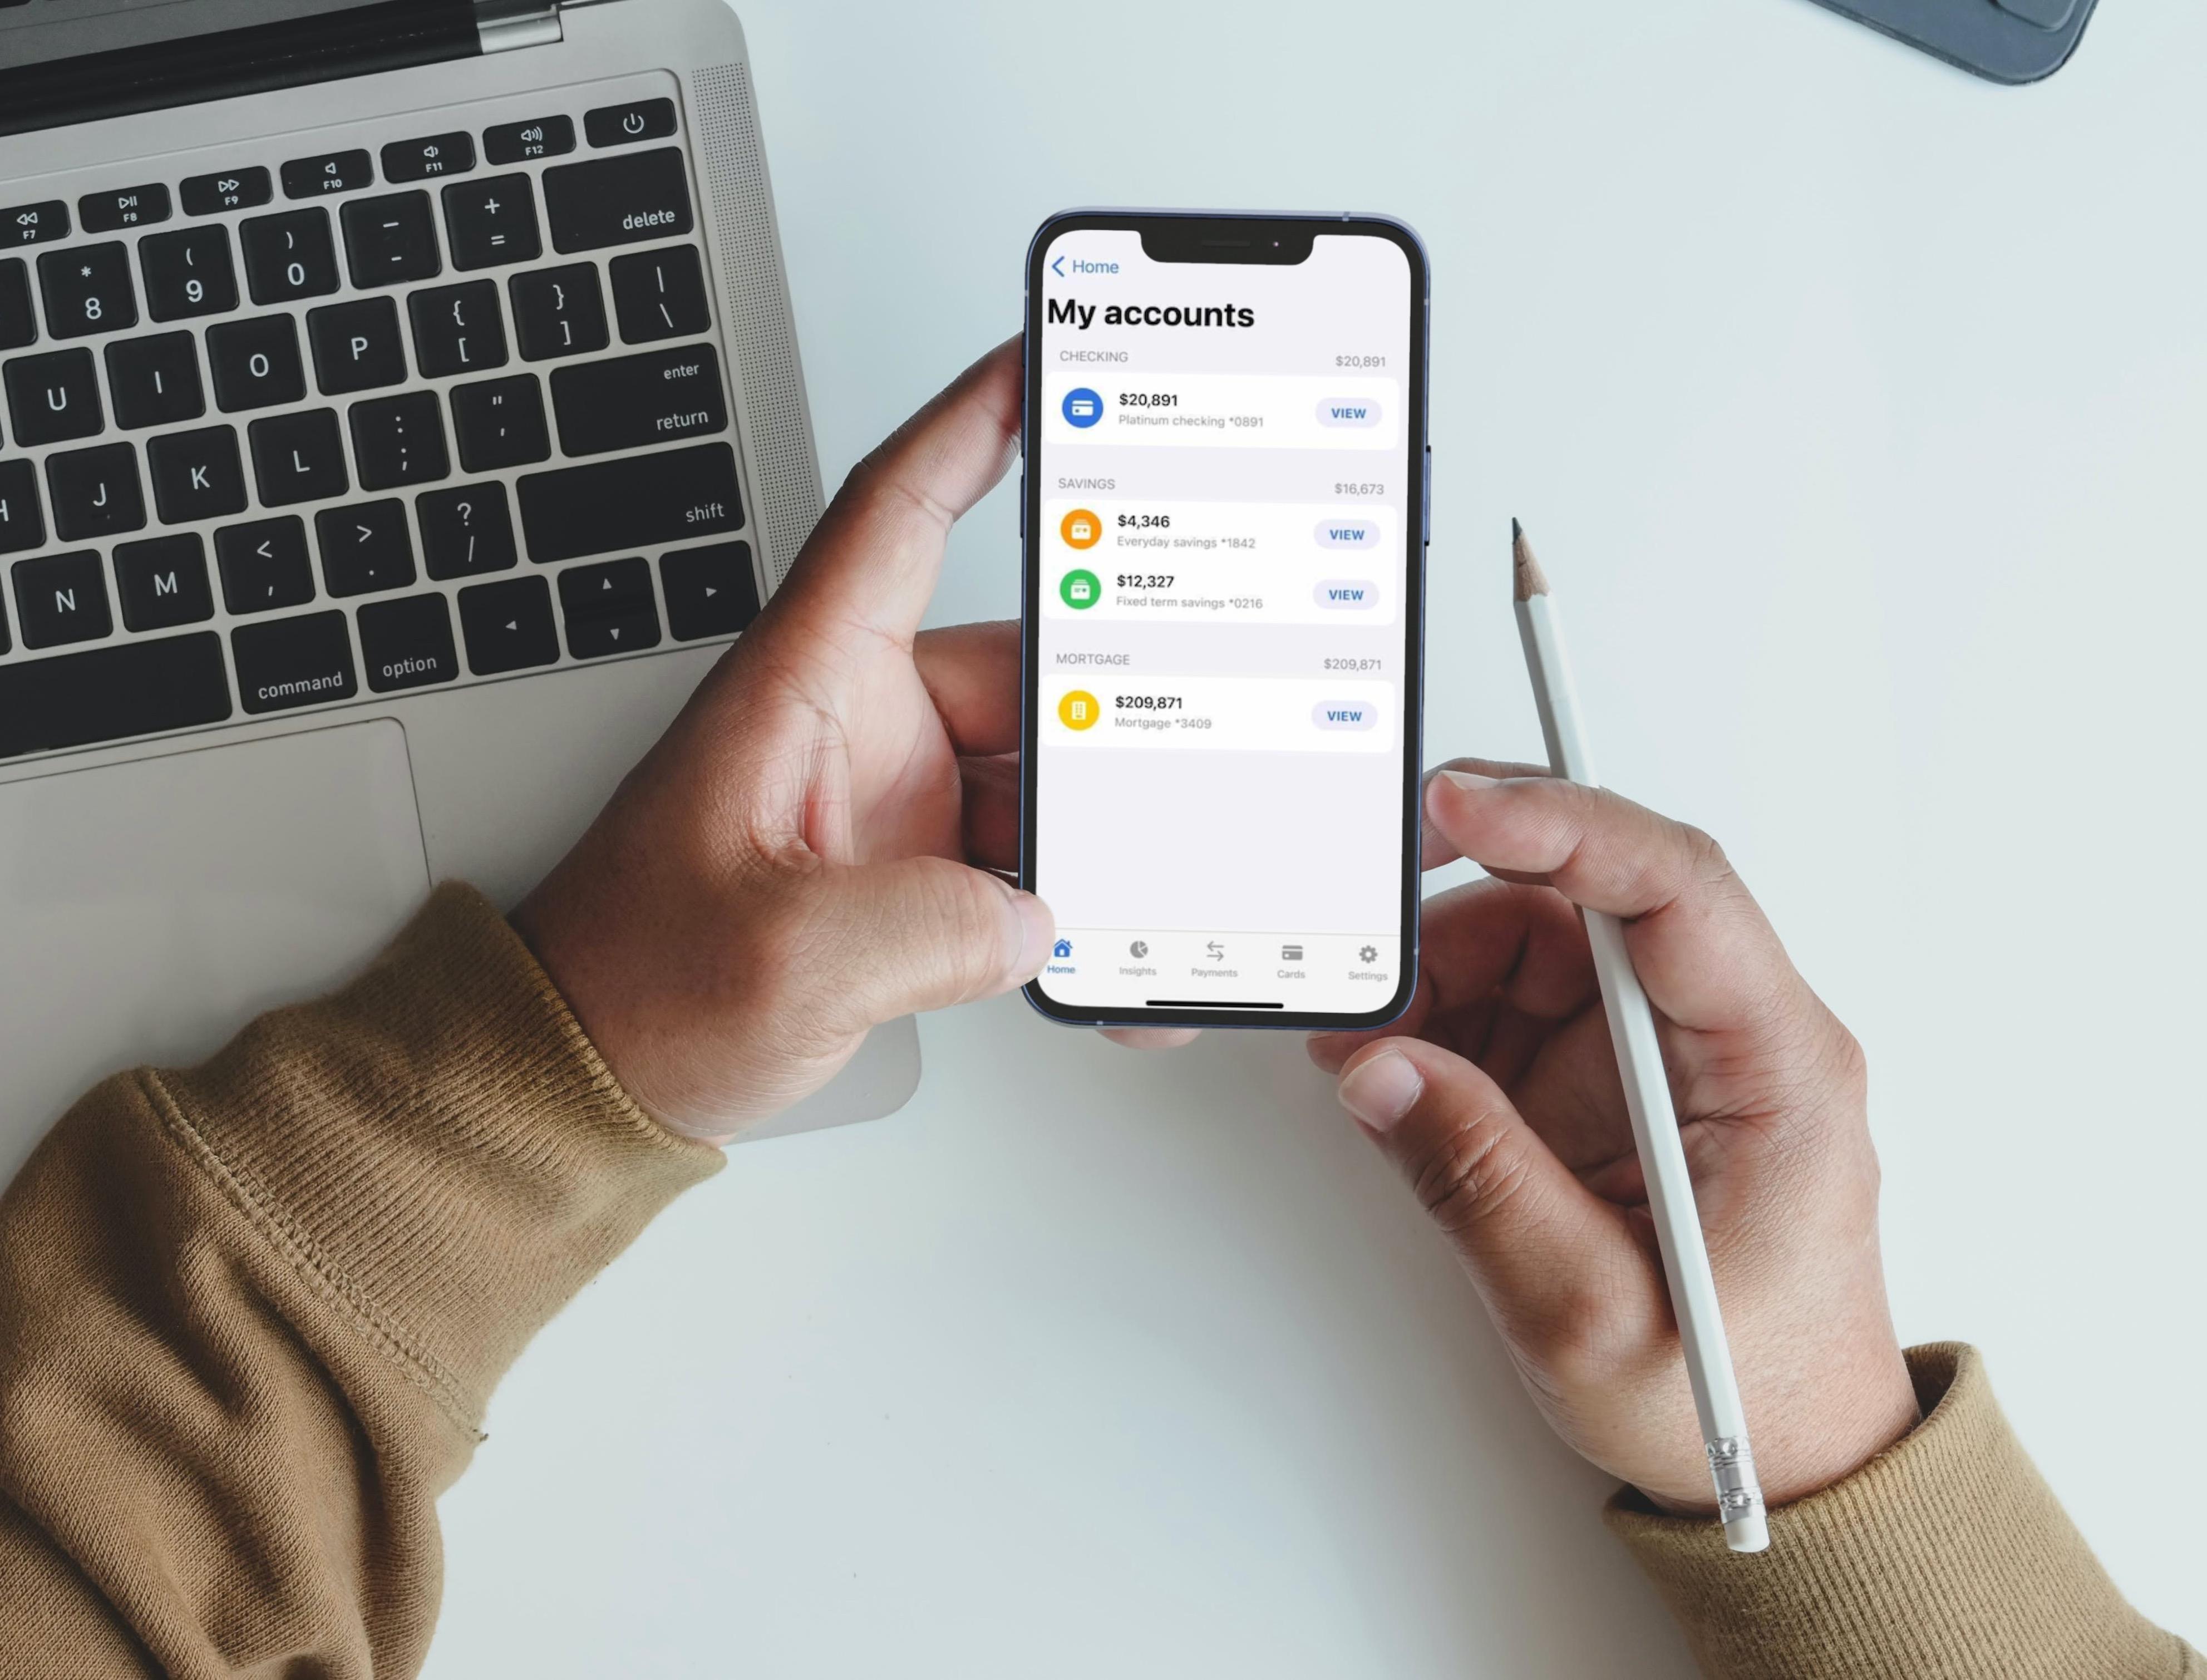 Arrow bank my accounts screen on smartphone